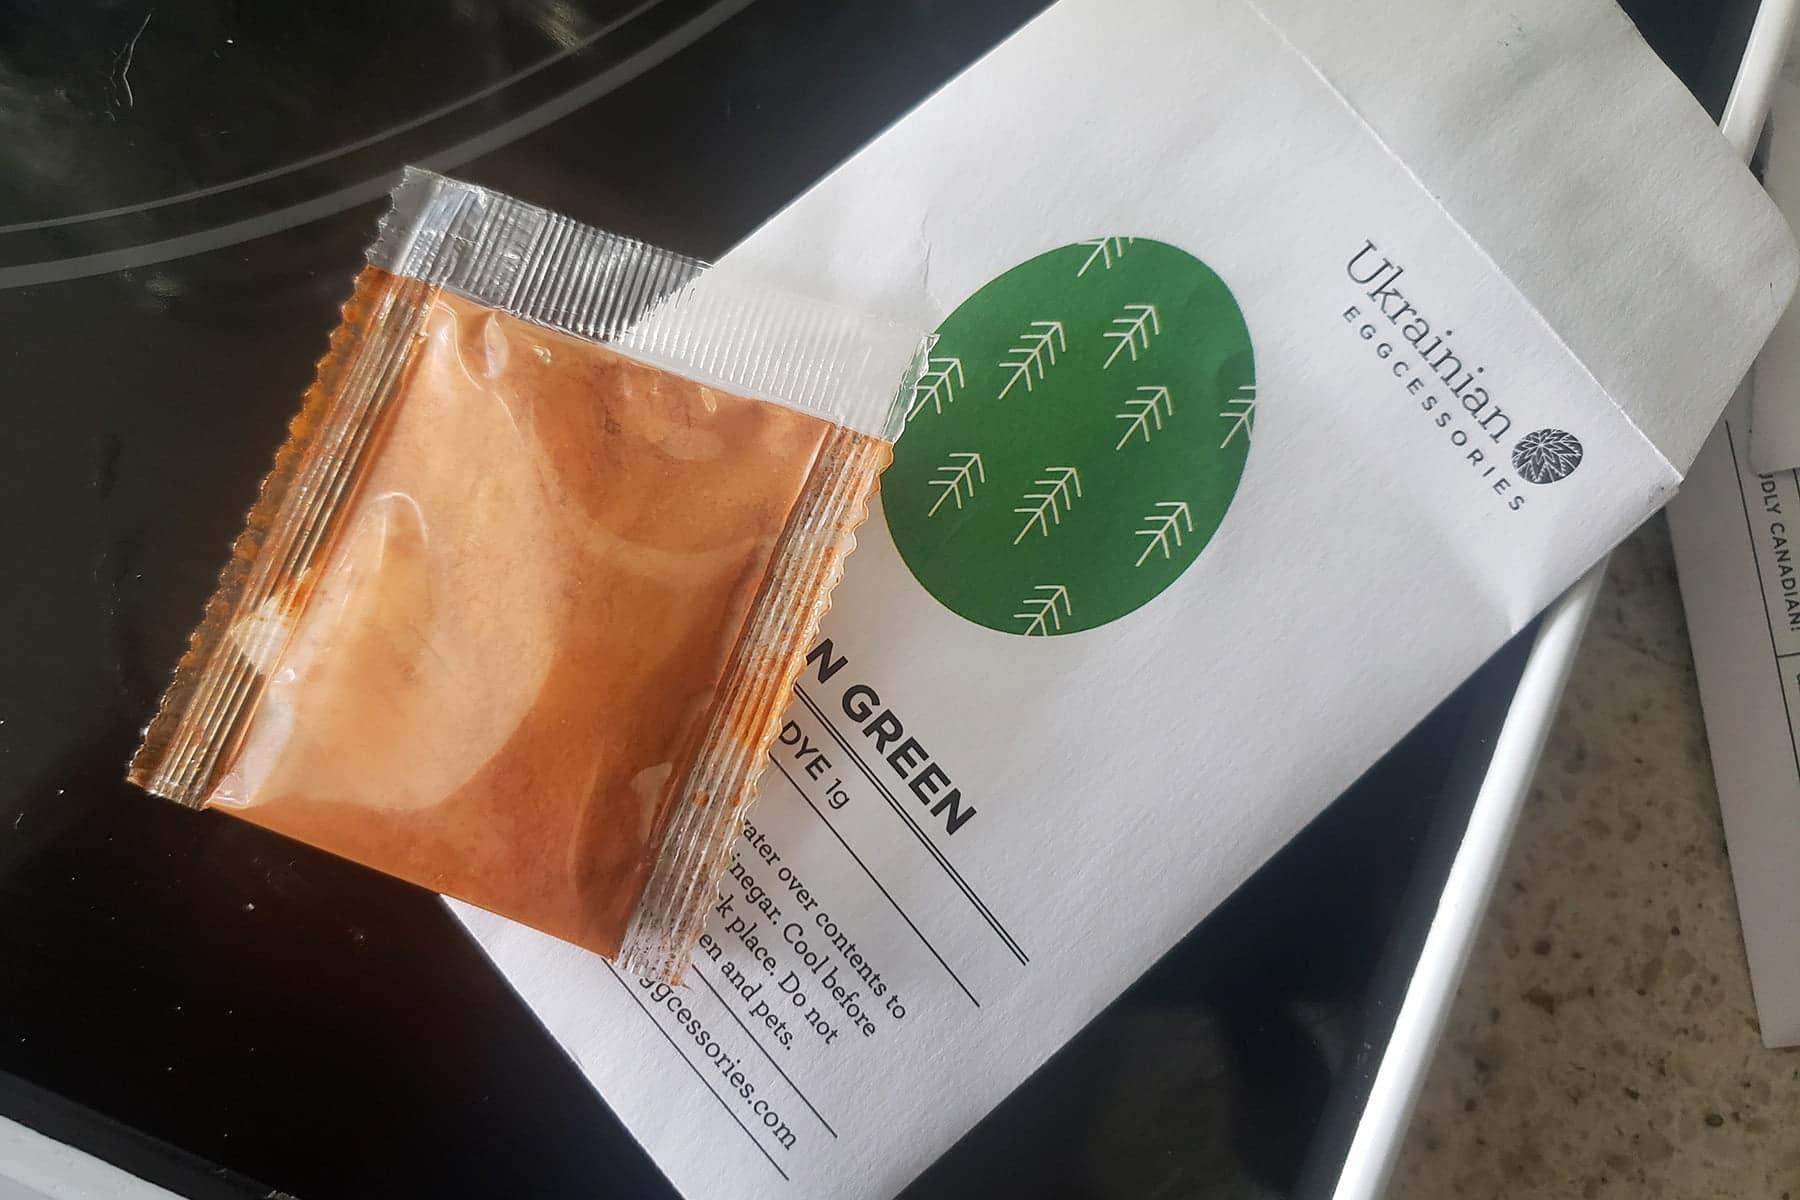 An envelope of green pysanky dye is shown under a little packet of orange powder.